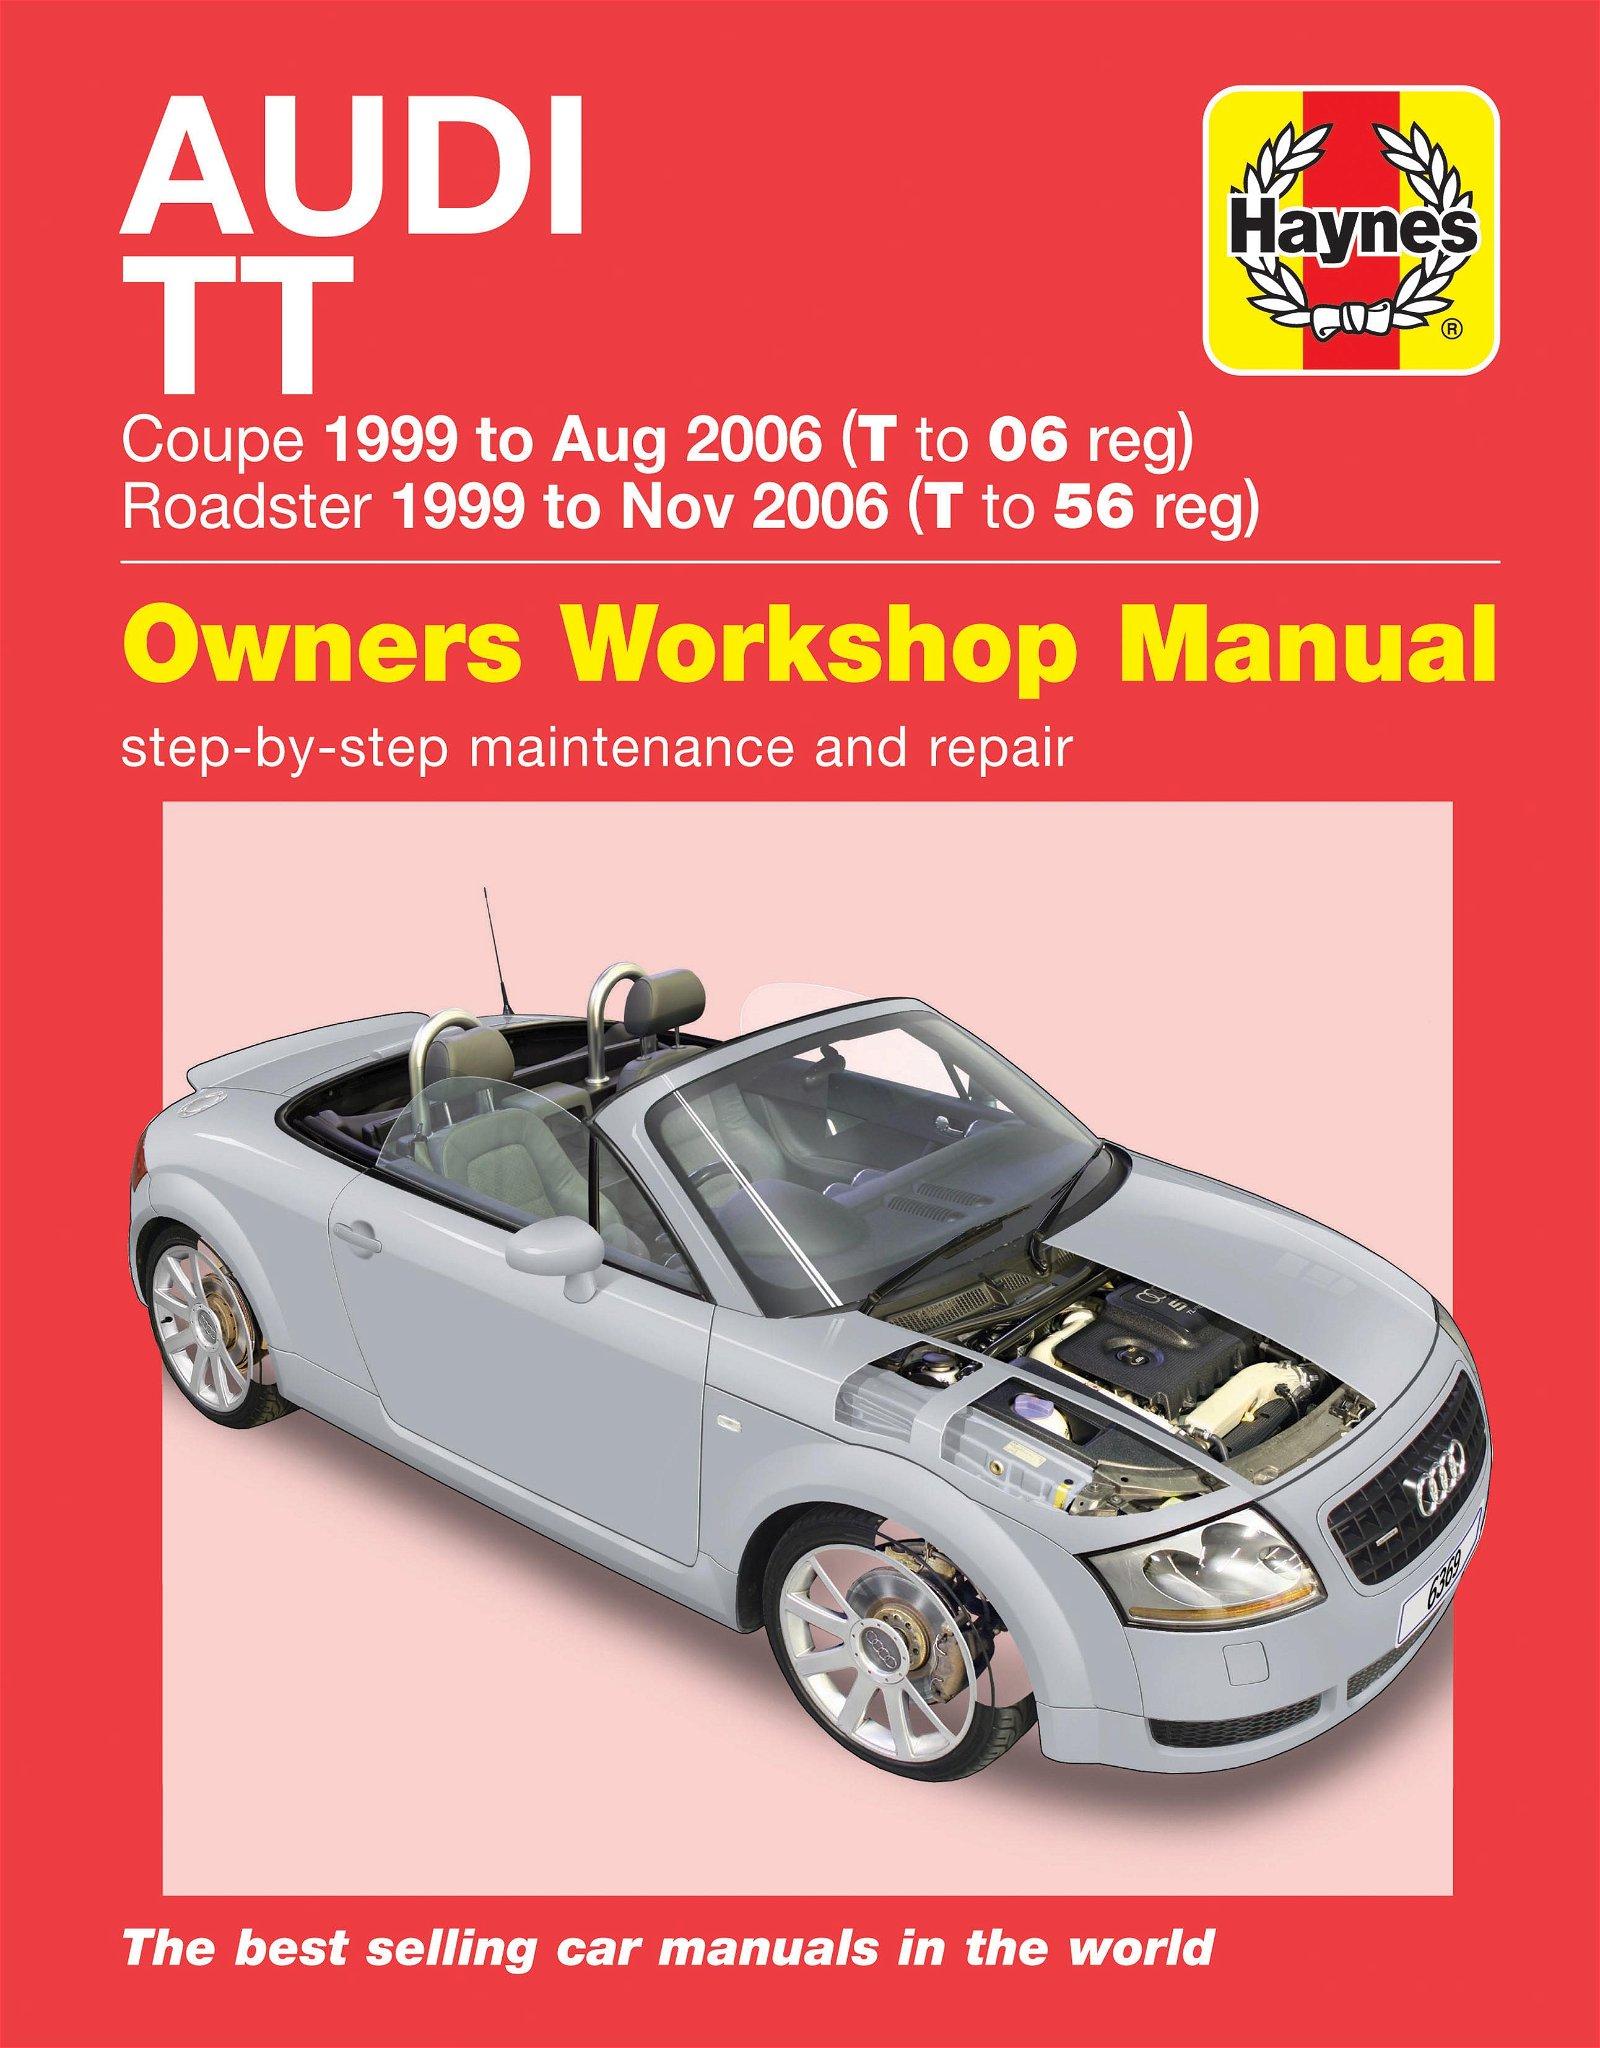 [Manuel UK en Anglais] Audi TT Mk I  (99 - 06)